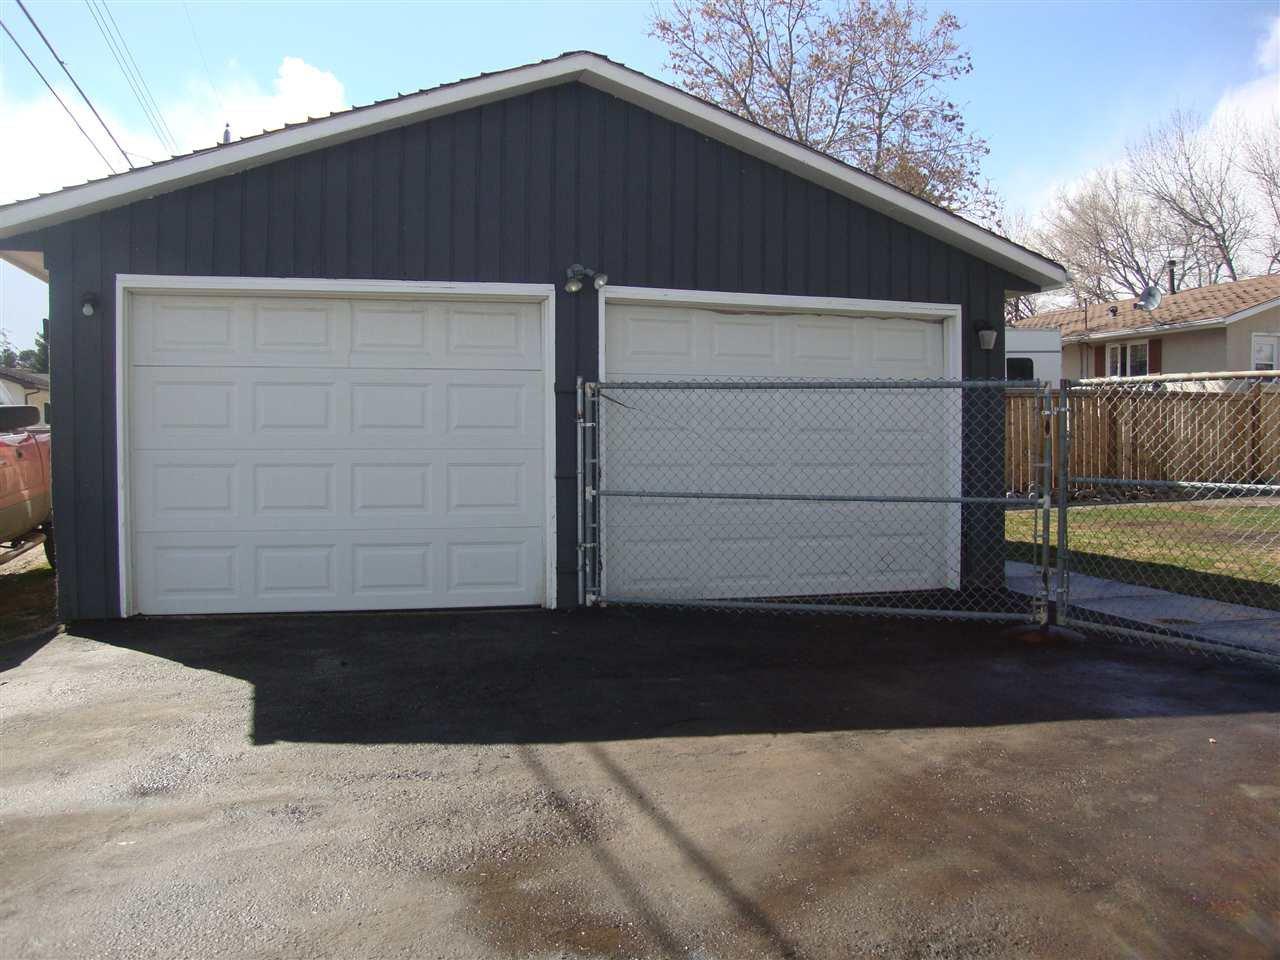 Photo 8: Photos: 4711 51A Avenue: Bon Accord House for sale : MLS®# E4149195